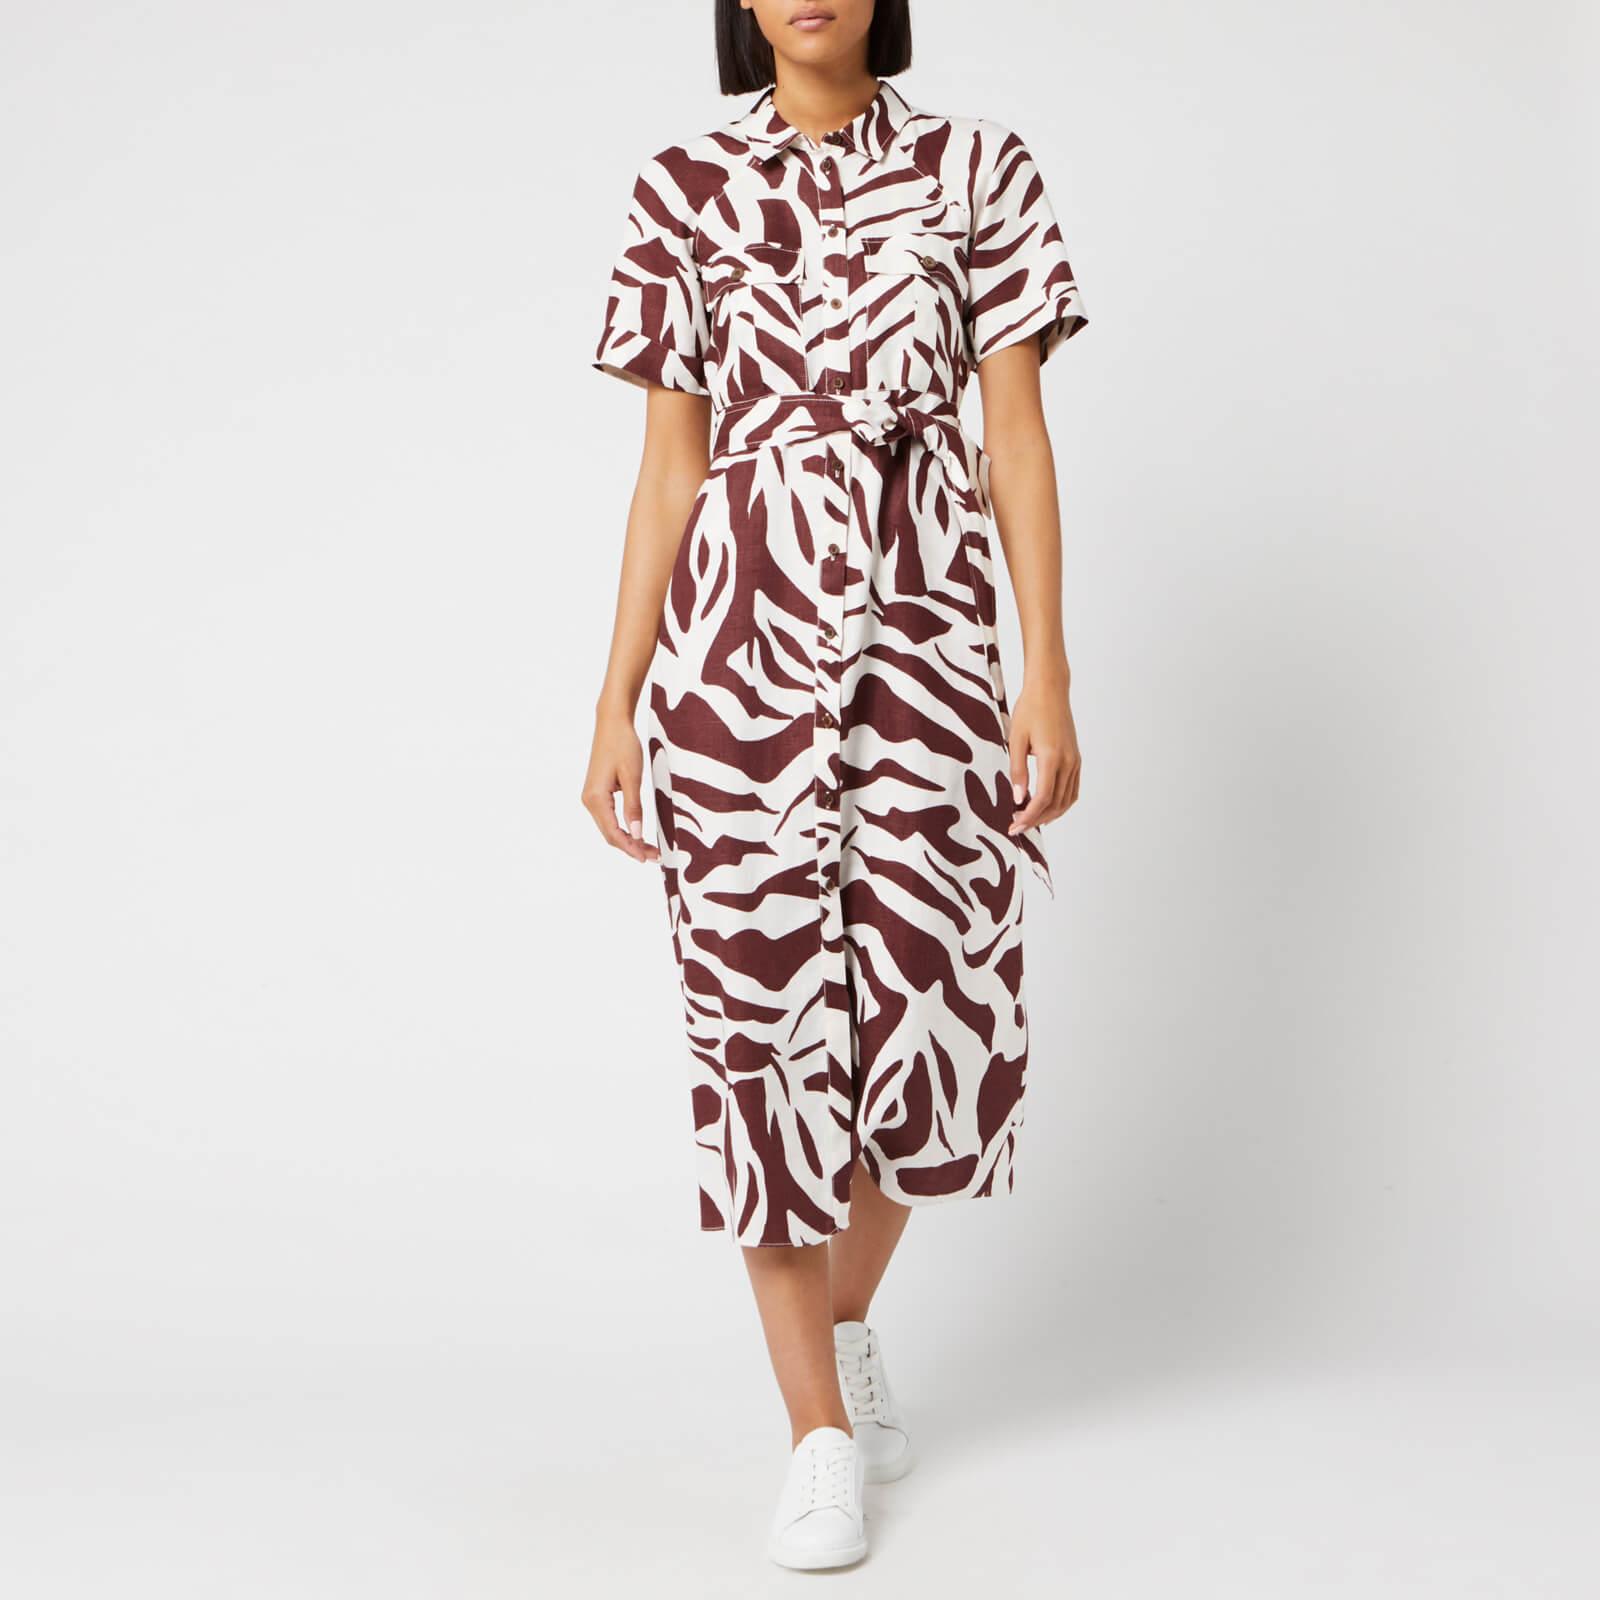 Whistles Women's Graphic Zebra Shirt Dress - Brown/Multi - UK 10 - Multi